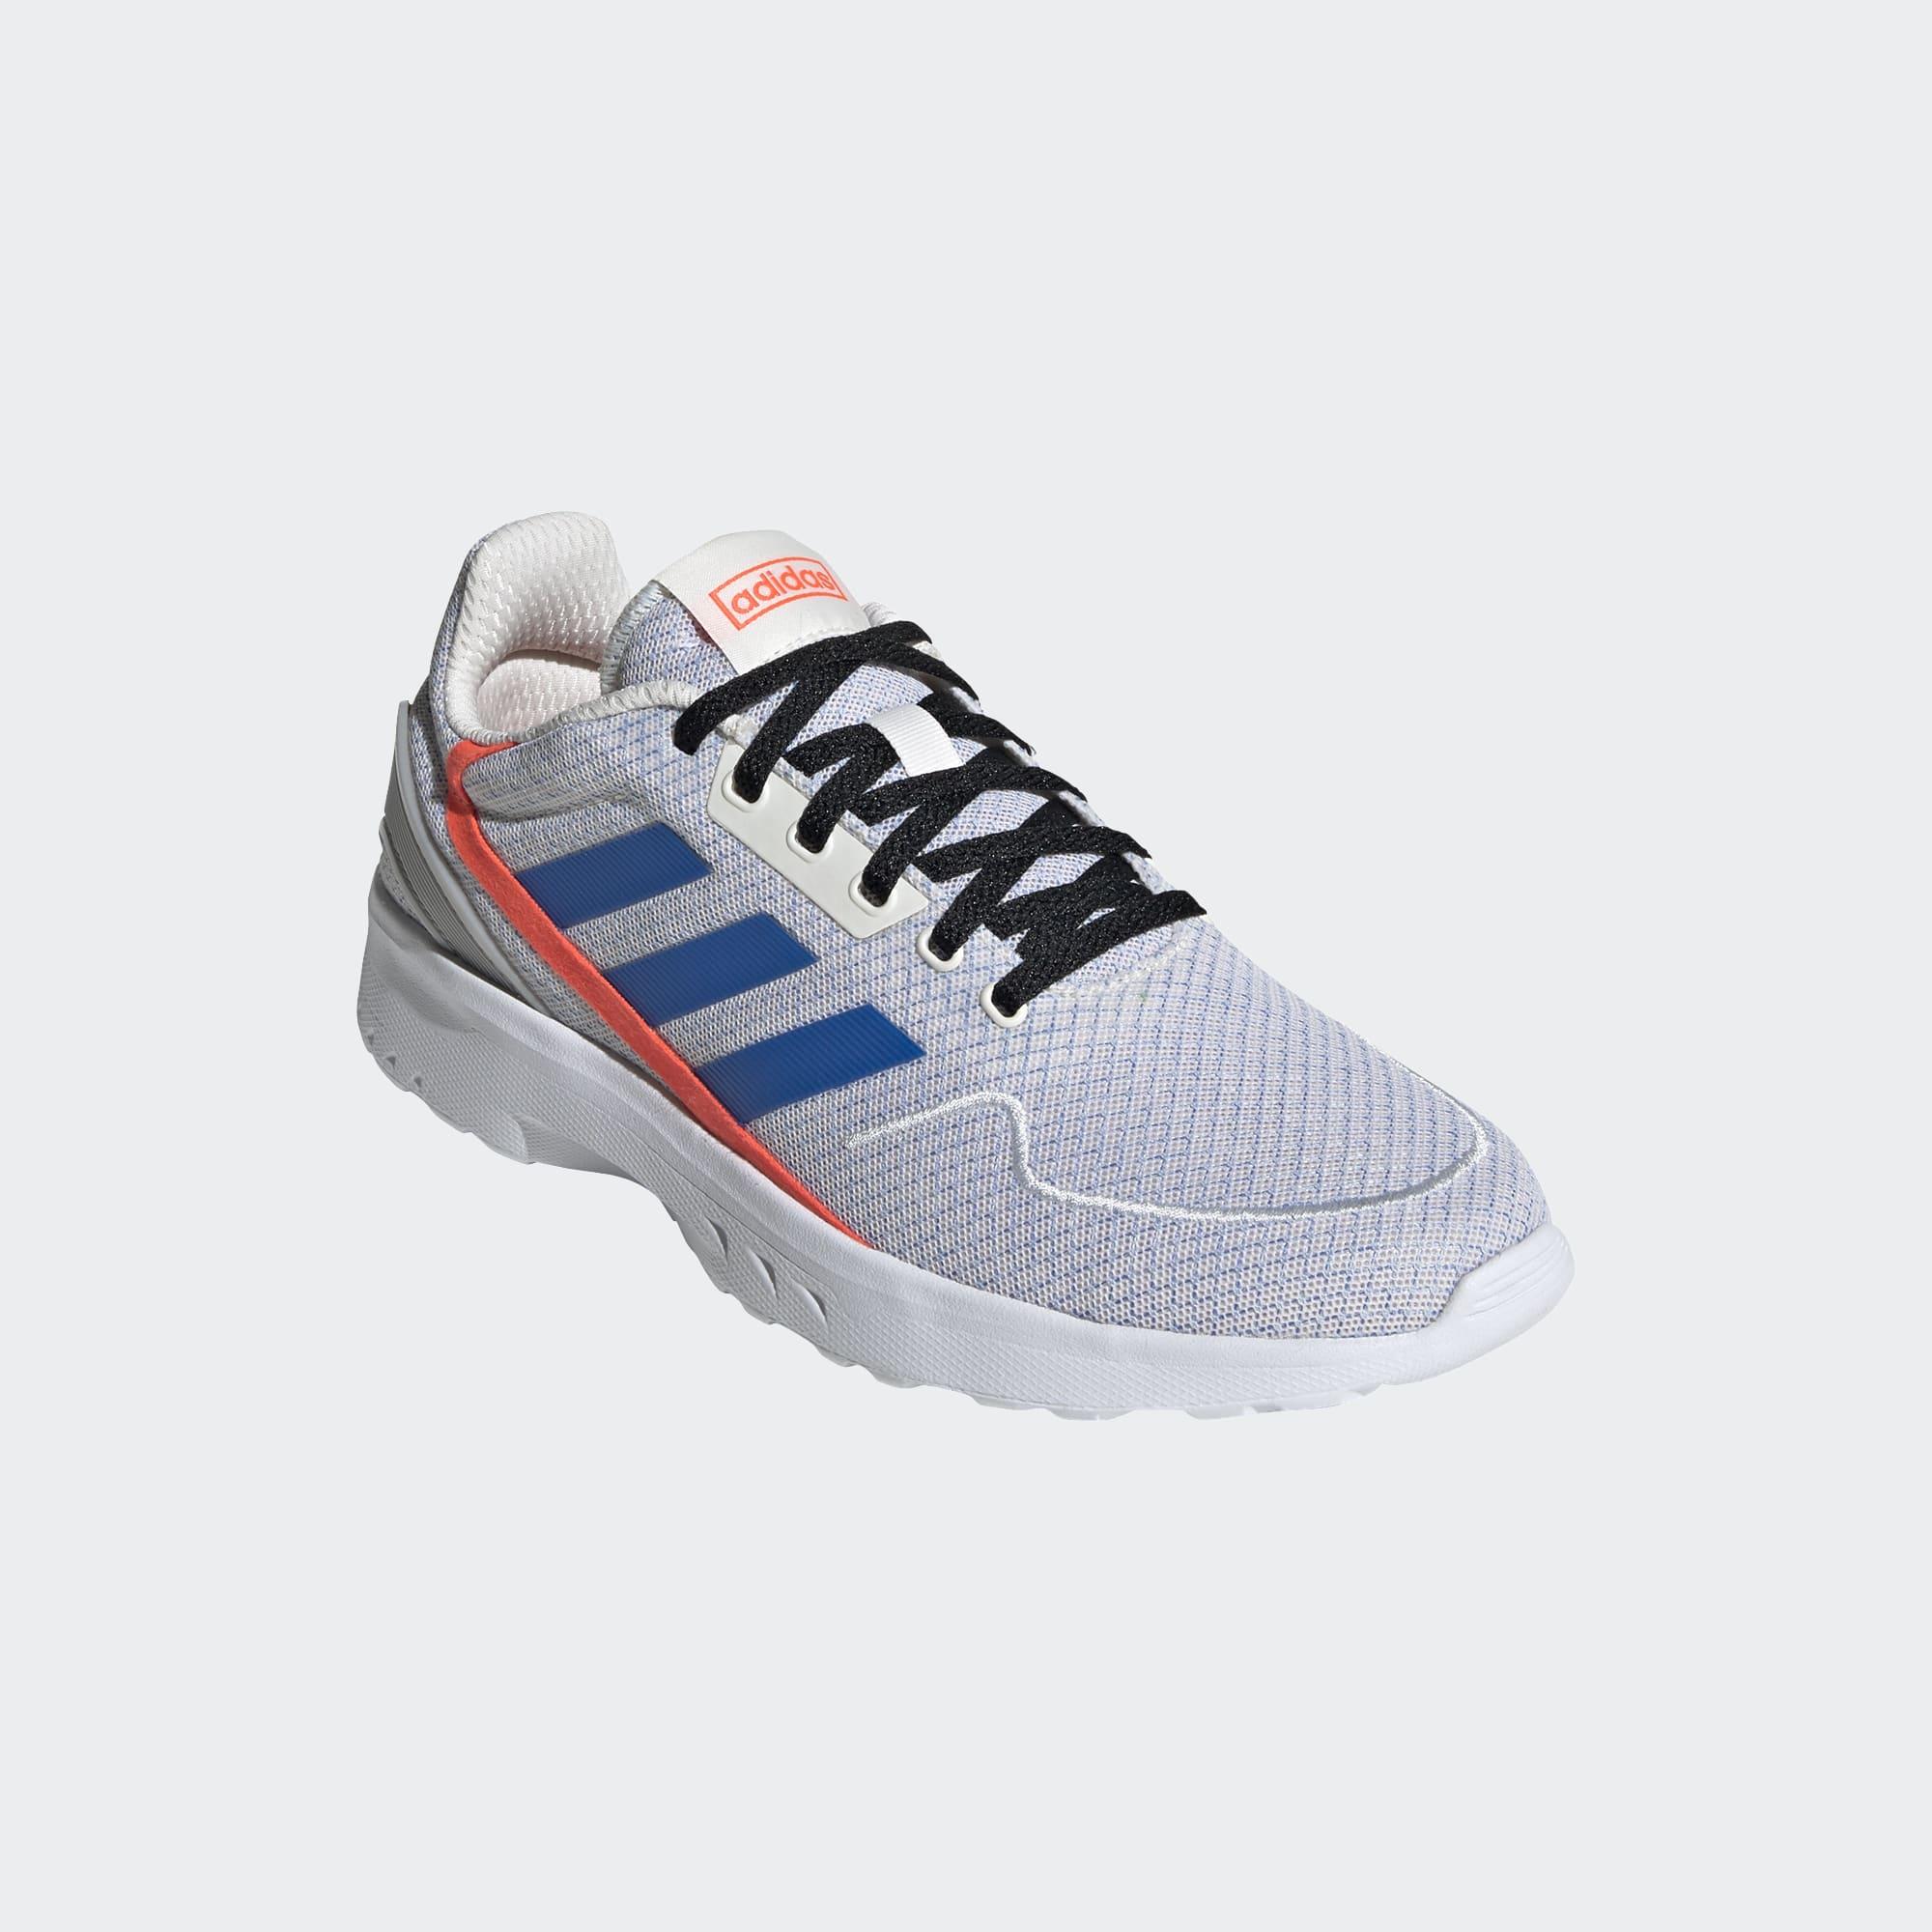 Adidas Nebzed Laufschuh